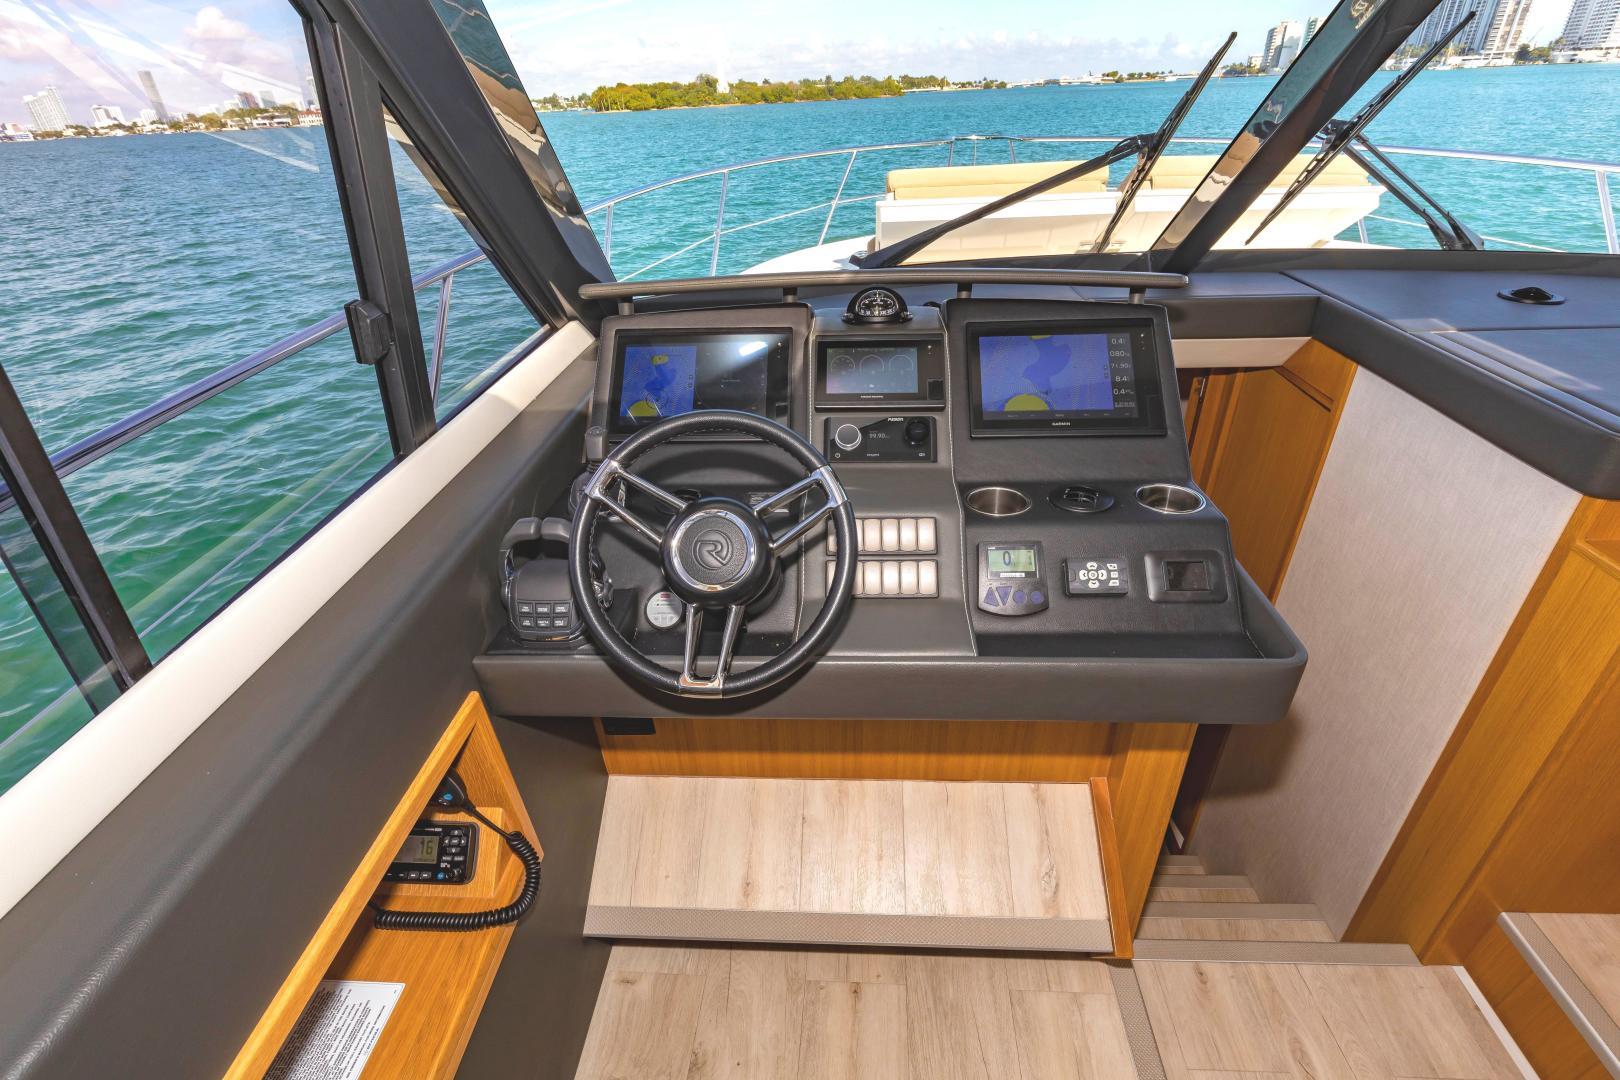 Riviera-395 SUV 2019-Ipanema Miami Beach-Florida-United States-1614907   Thumbnail